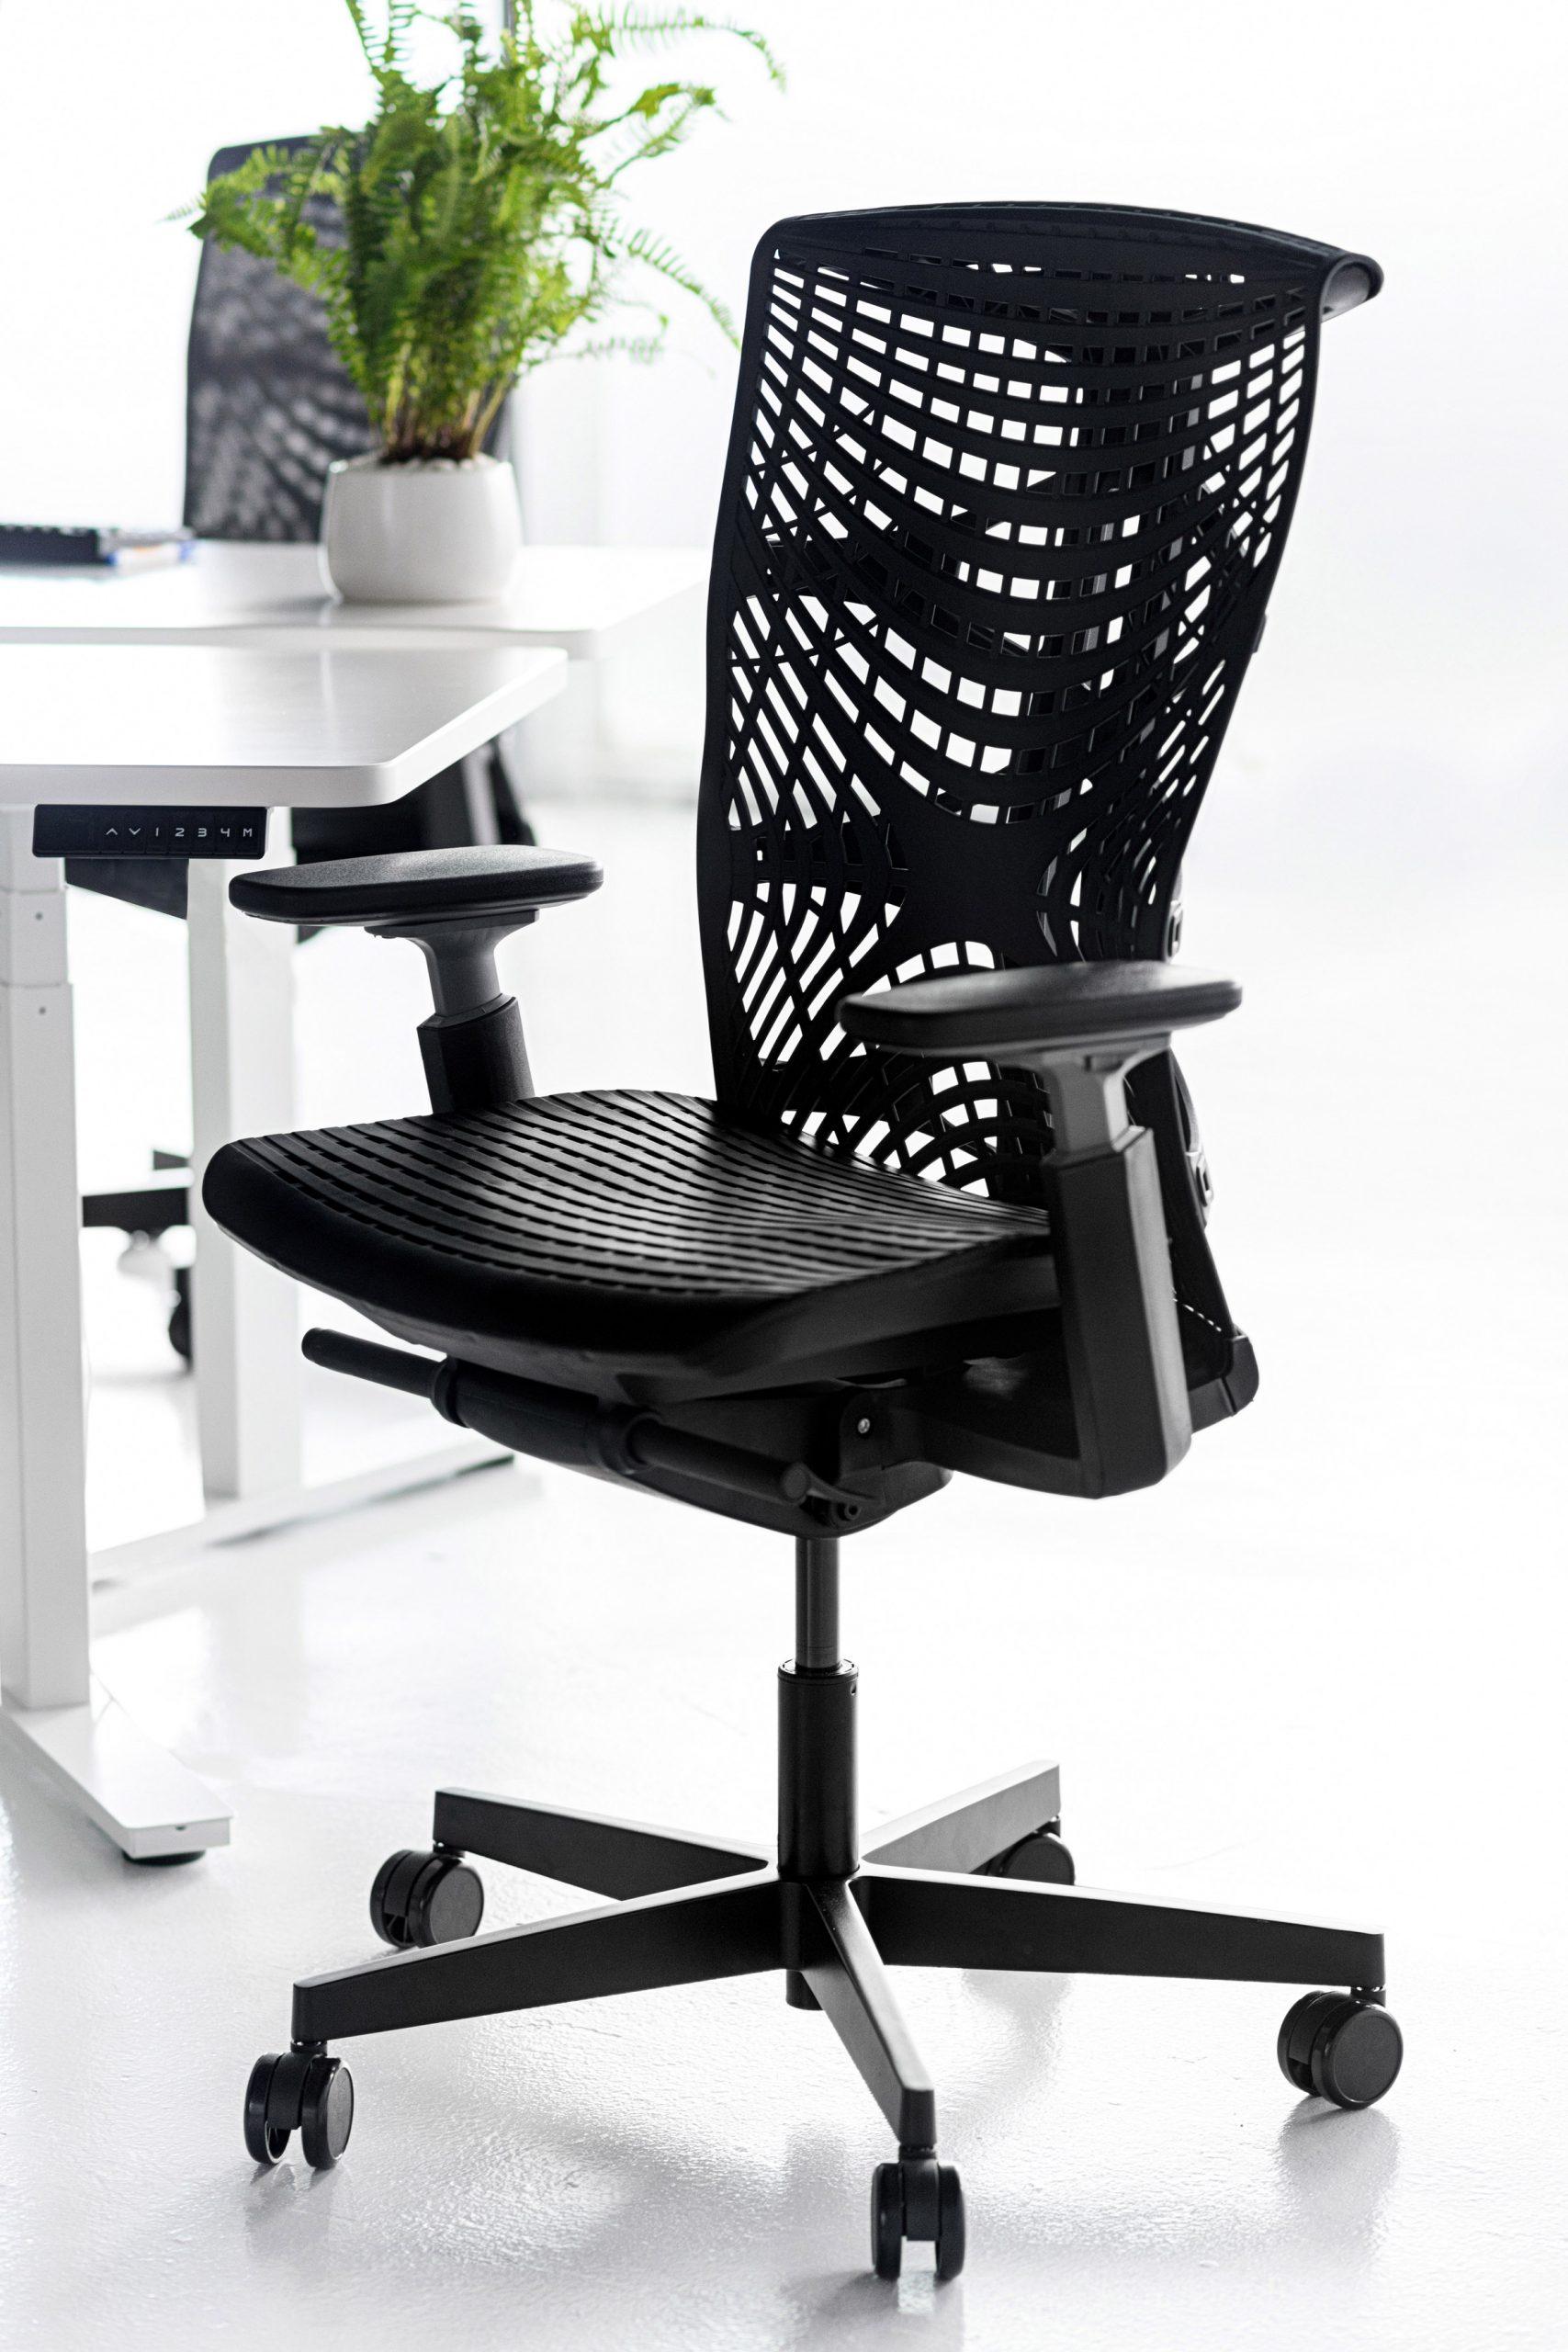 Kinn Chair in black